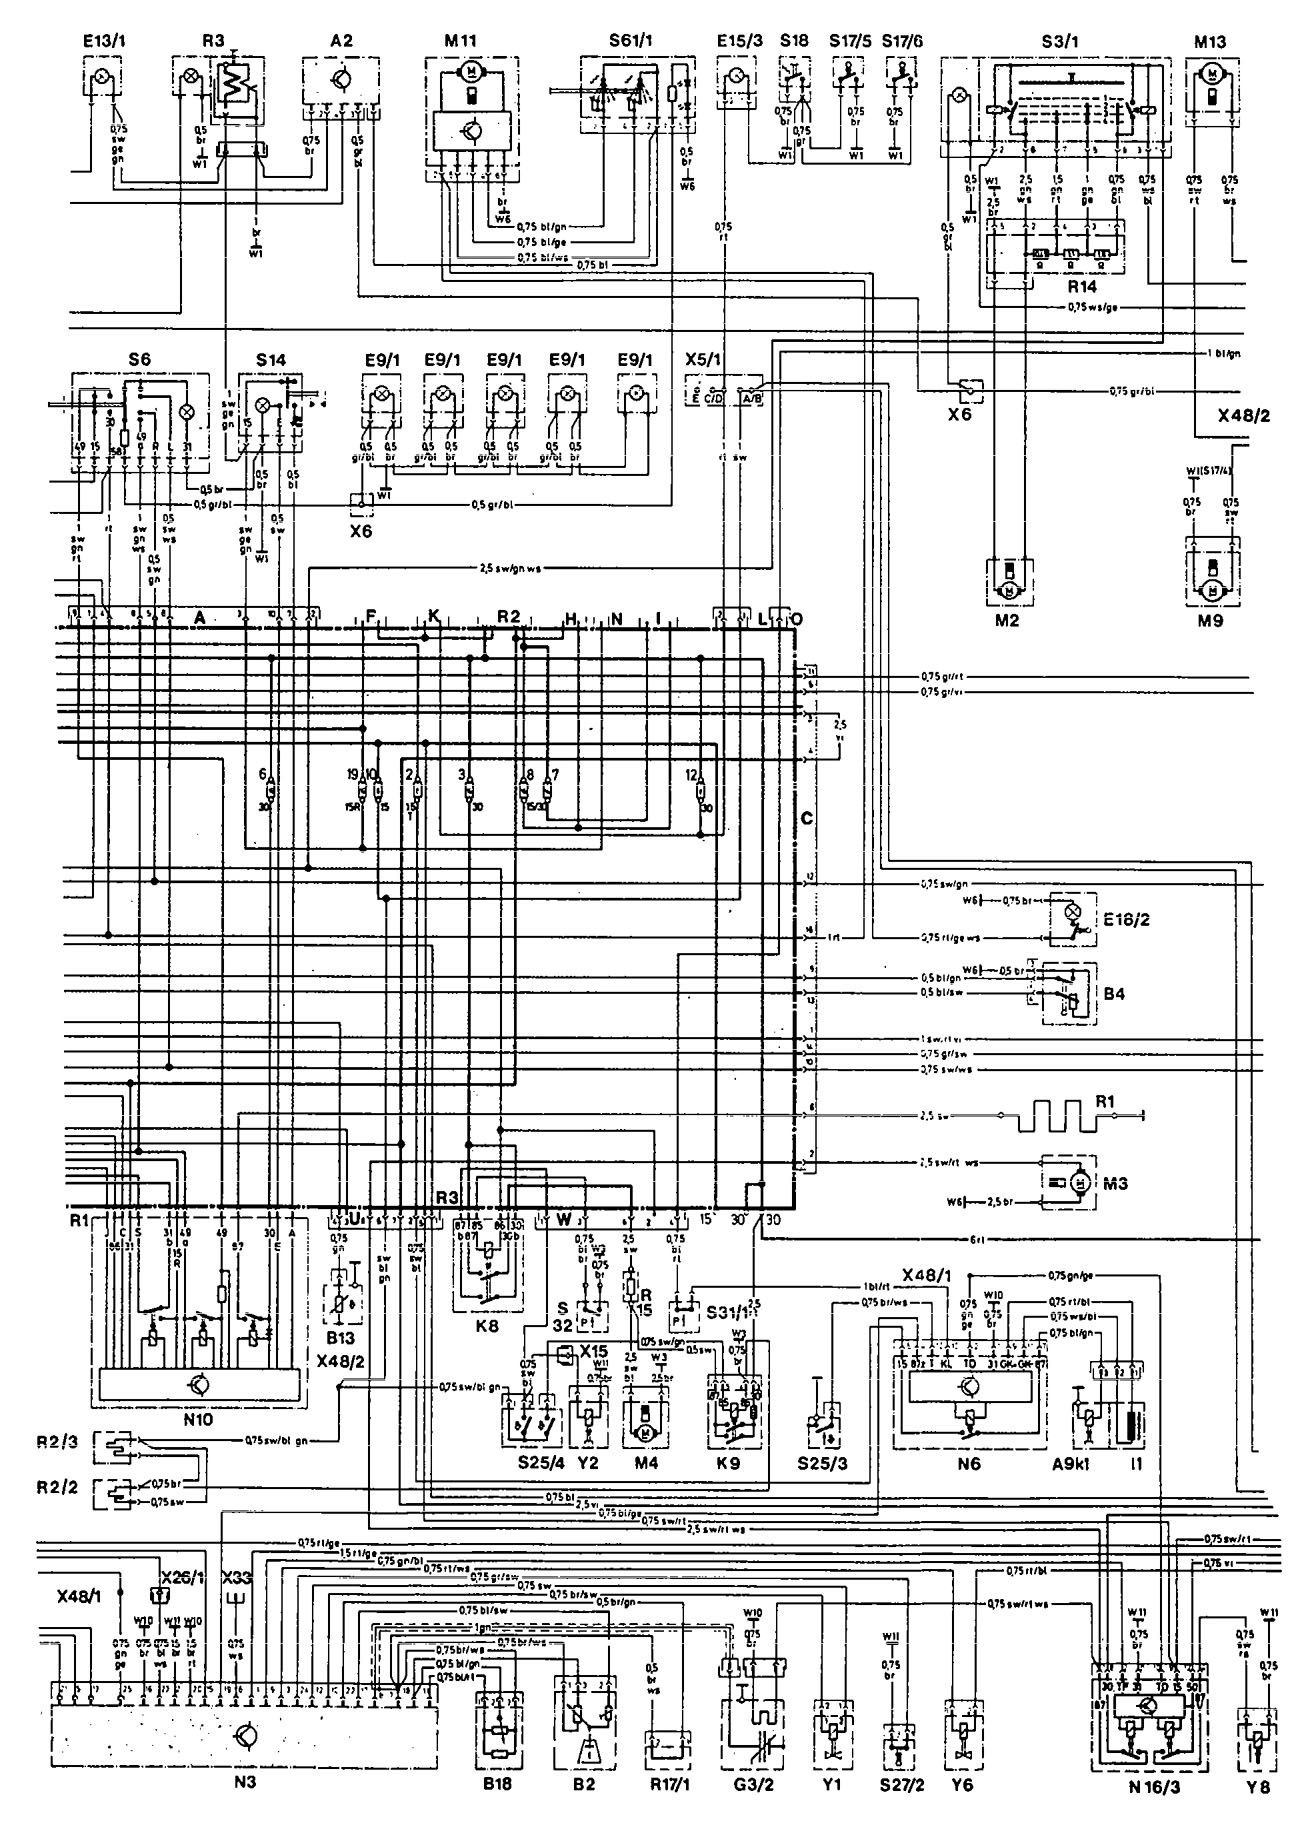 Mercedes E320 Radio Wiring 1994 Benz Diagram E Diagrams Fuel Controls Harness